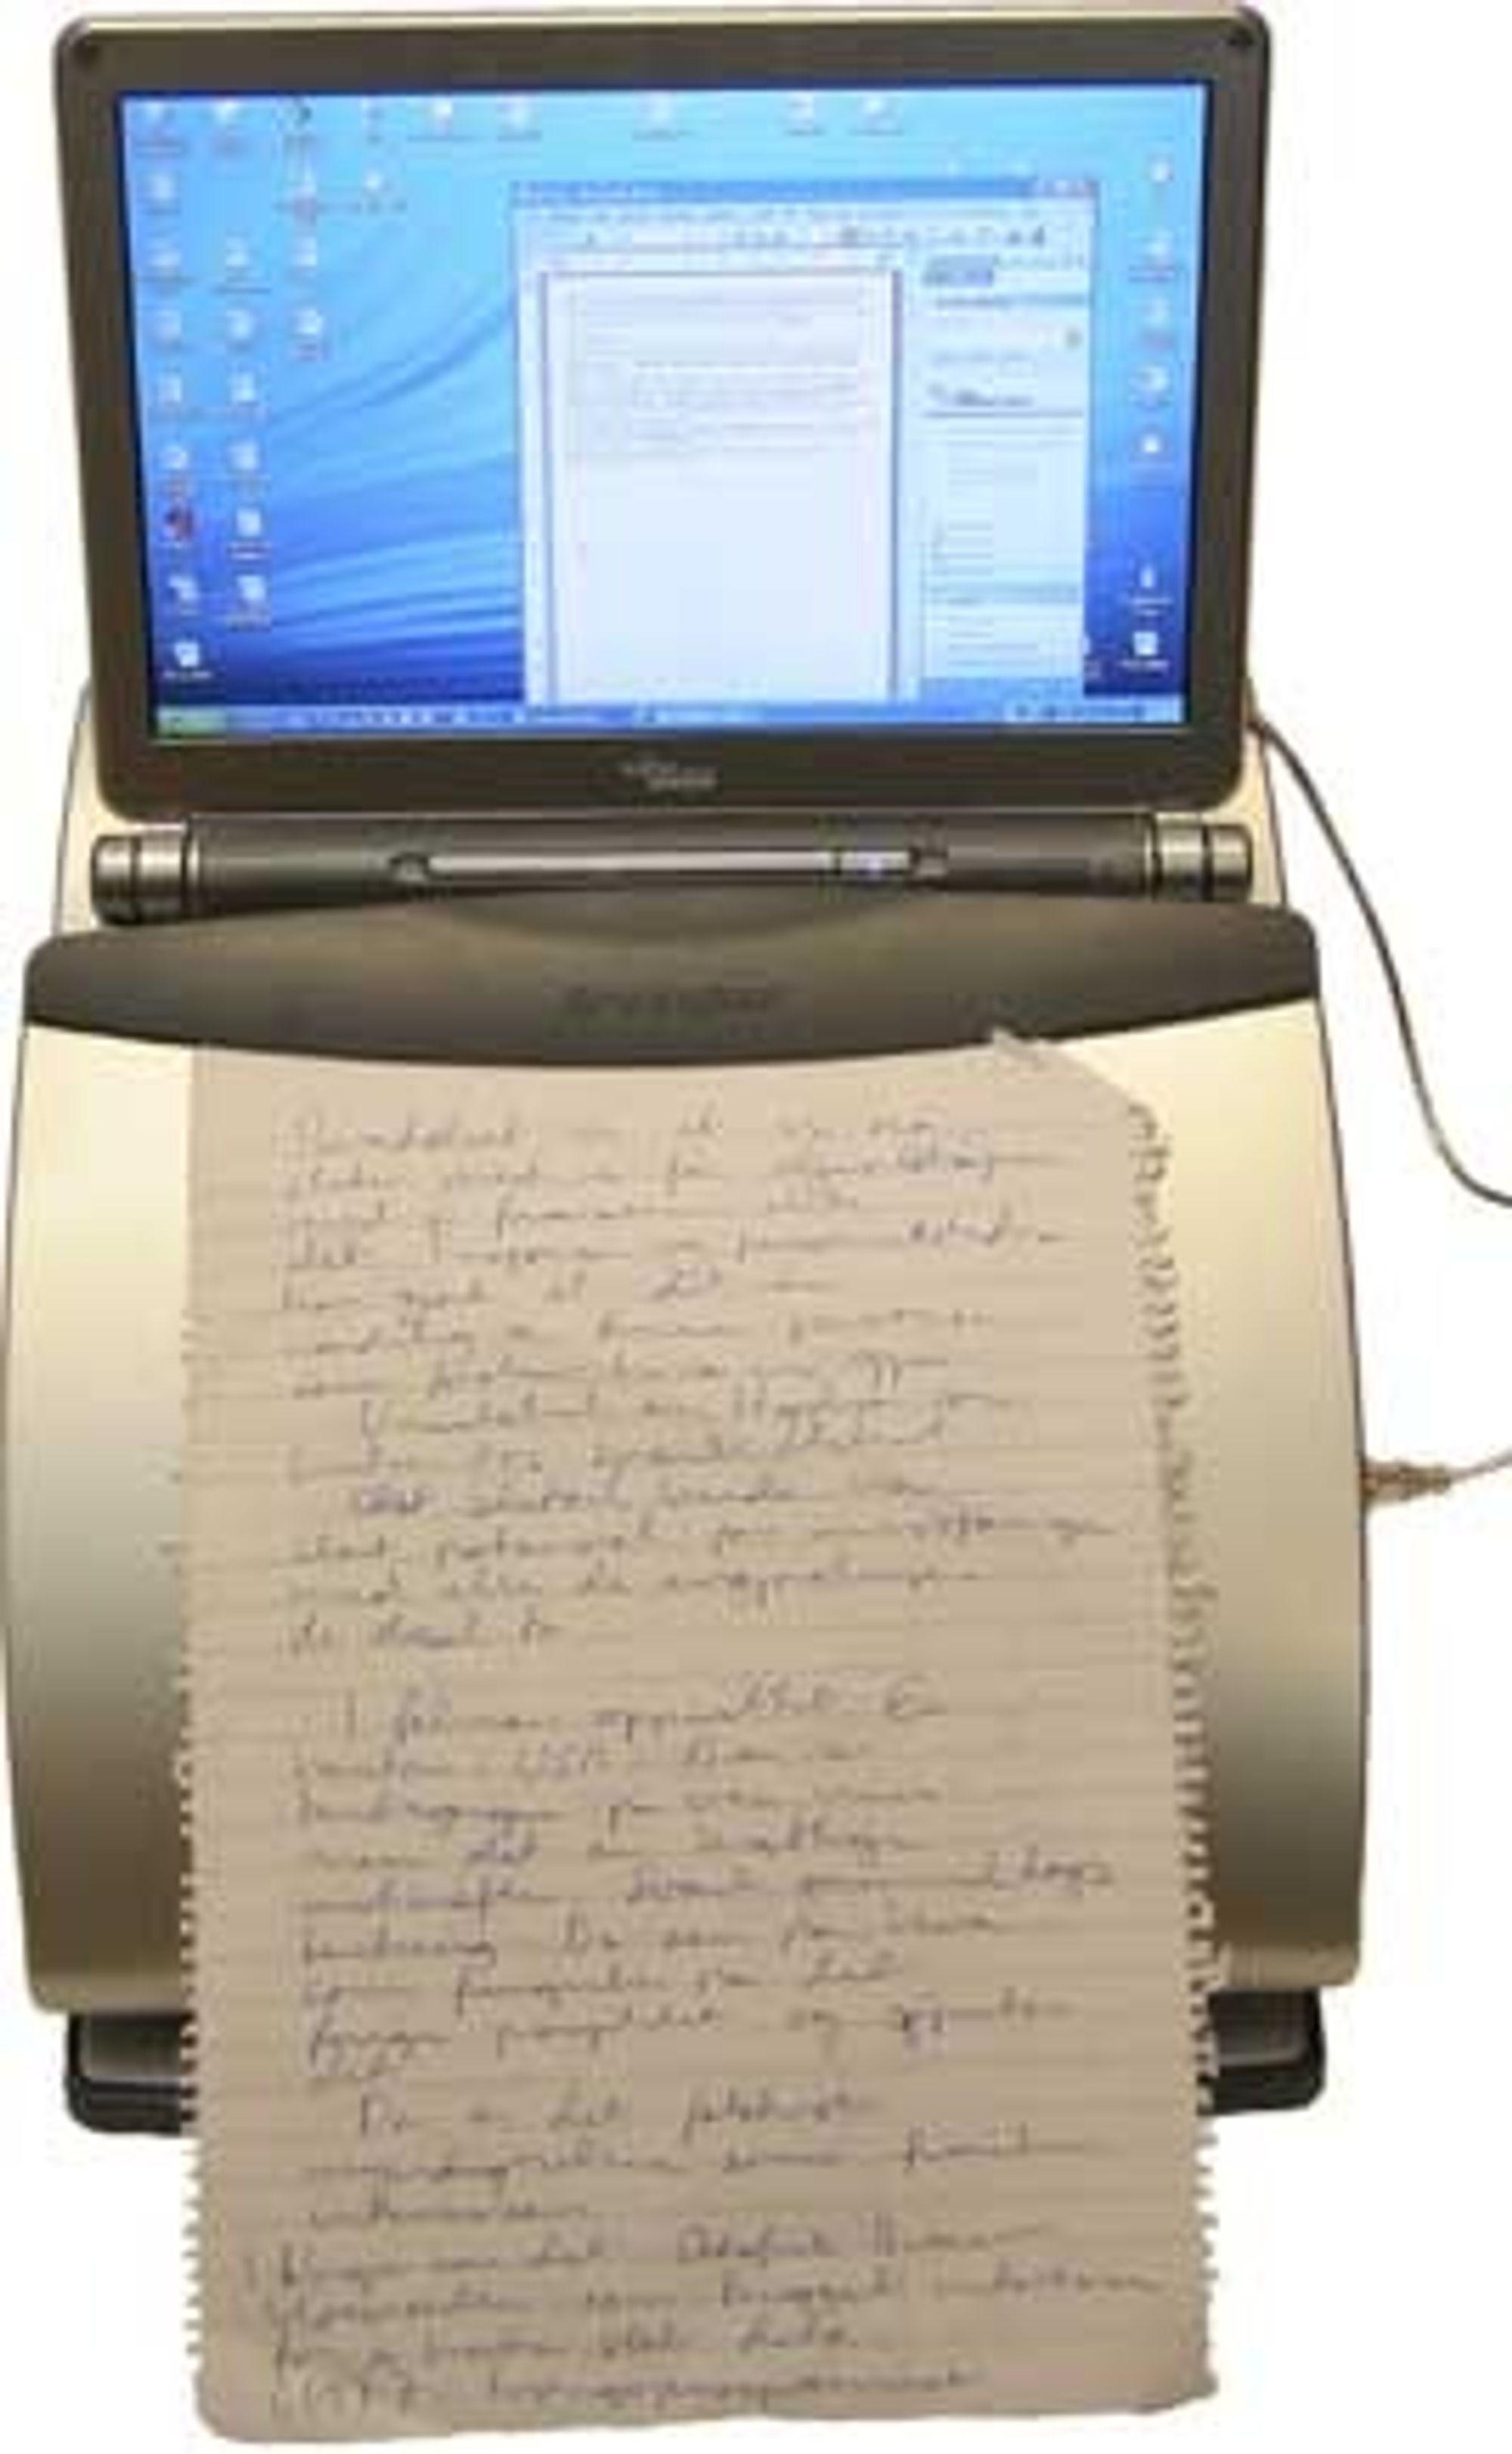 Notebook Station fra Kensington, med klips for notater.